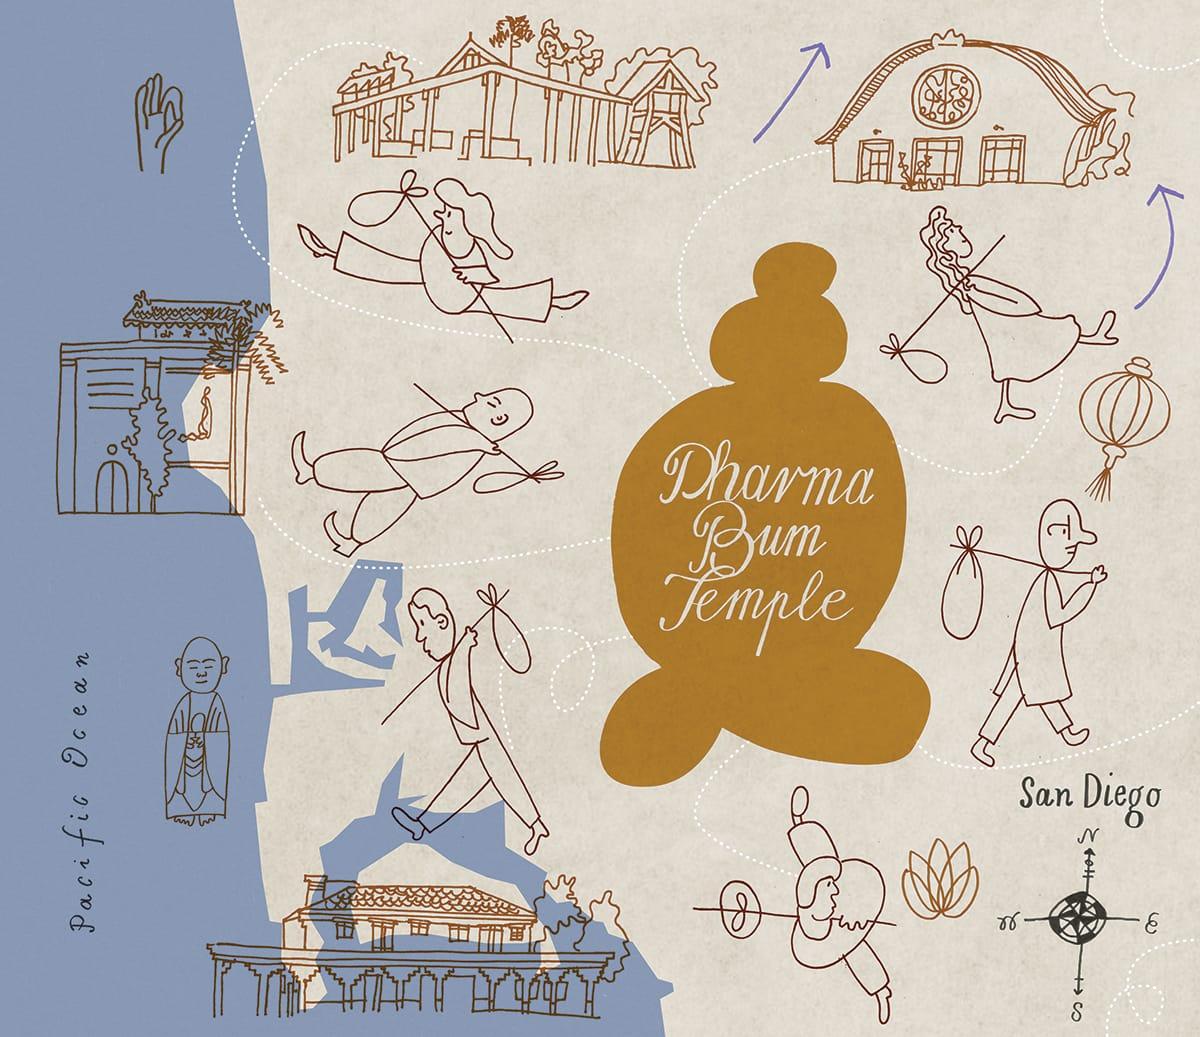 Dharma Bum Temple, Buddhadharma, Lion's Roar, Buddhism, San Diego